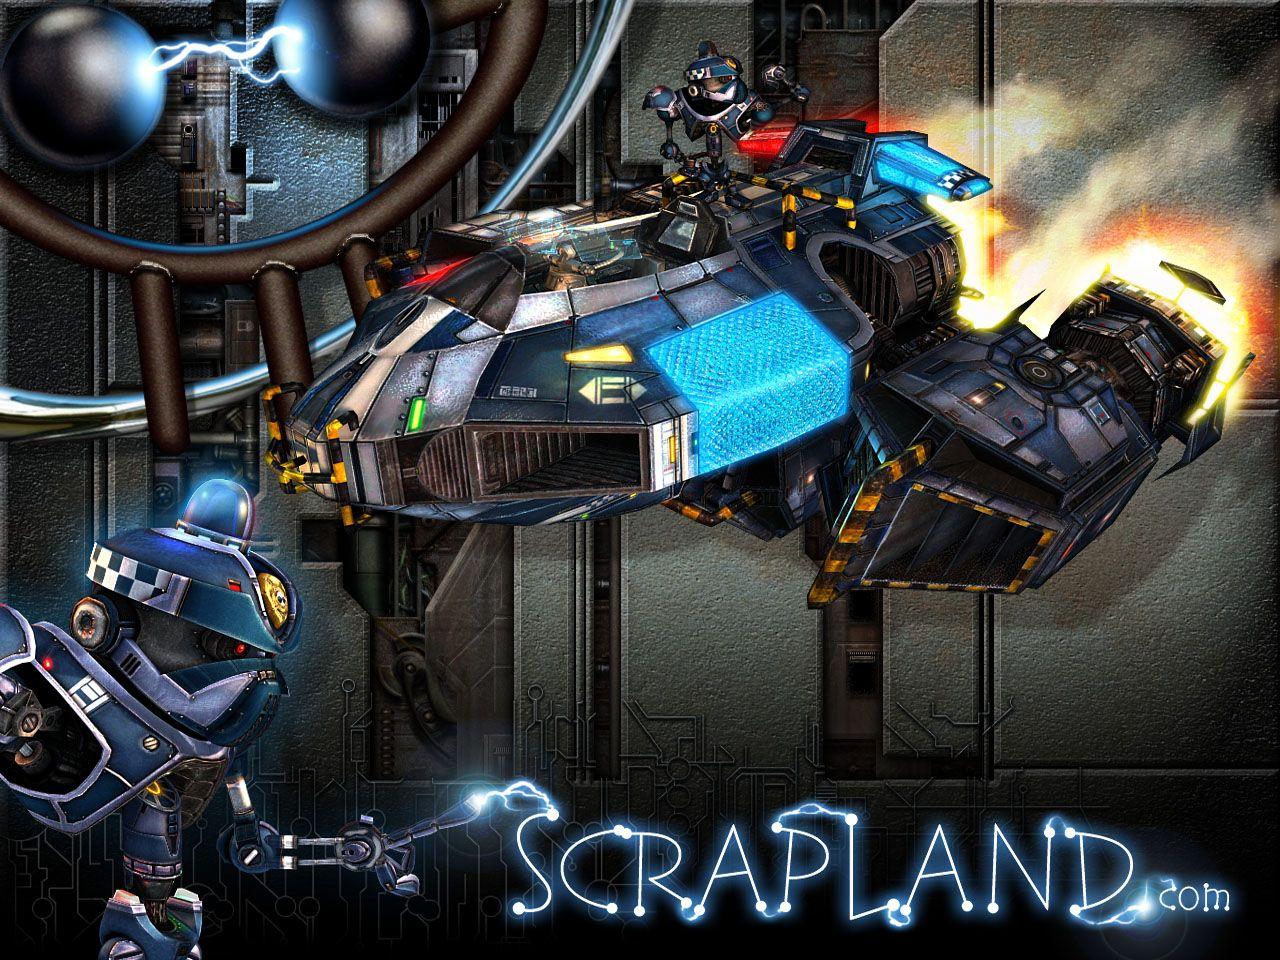 Recenze Scrapland 3284